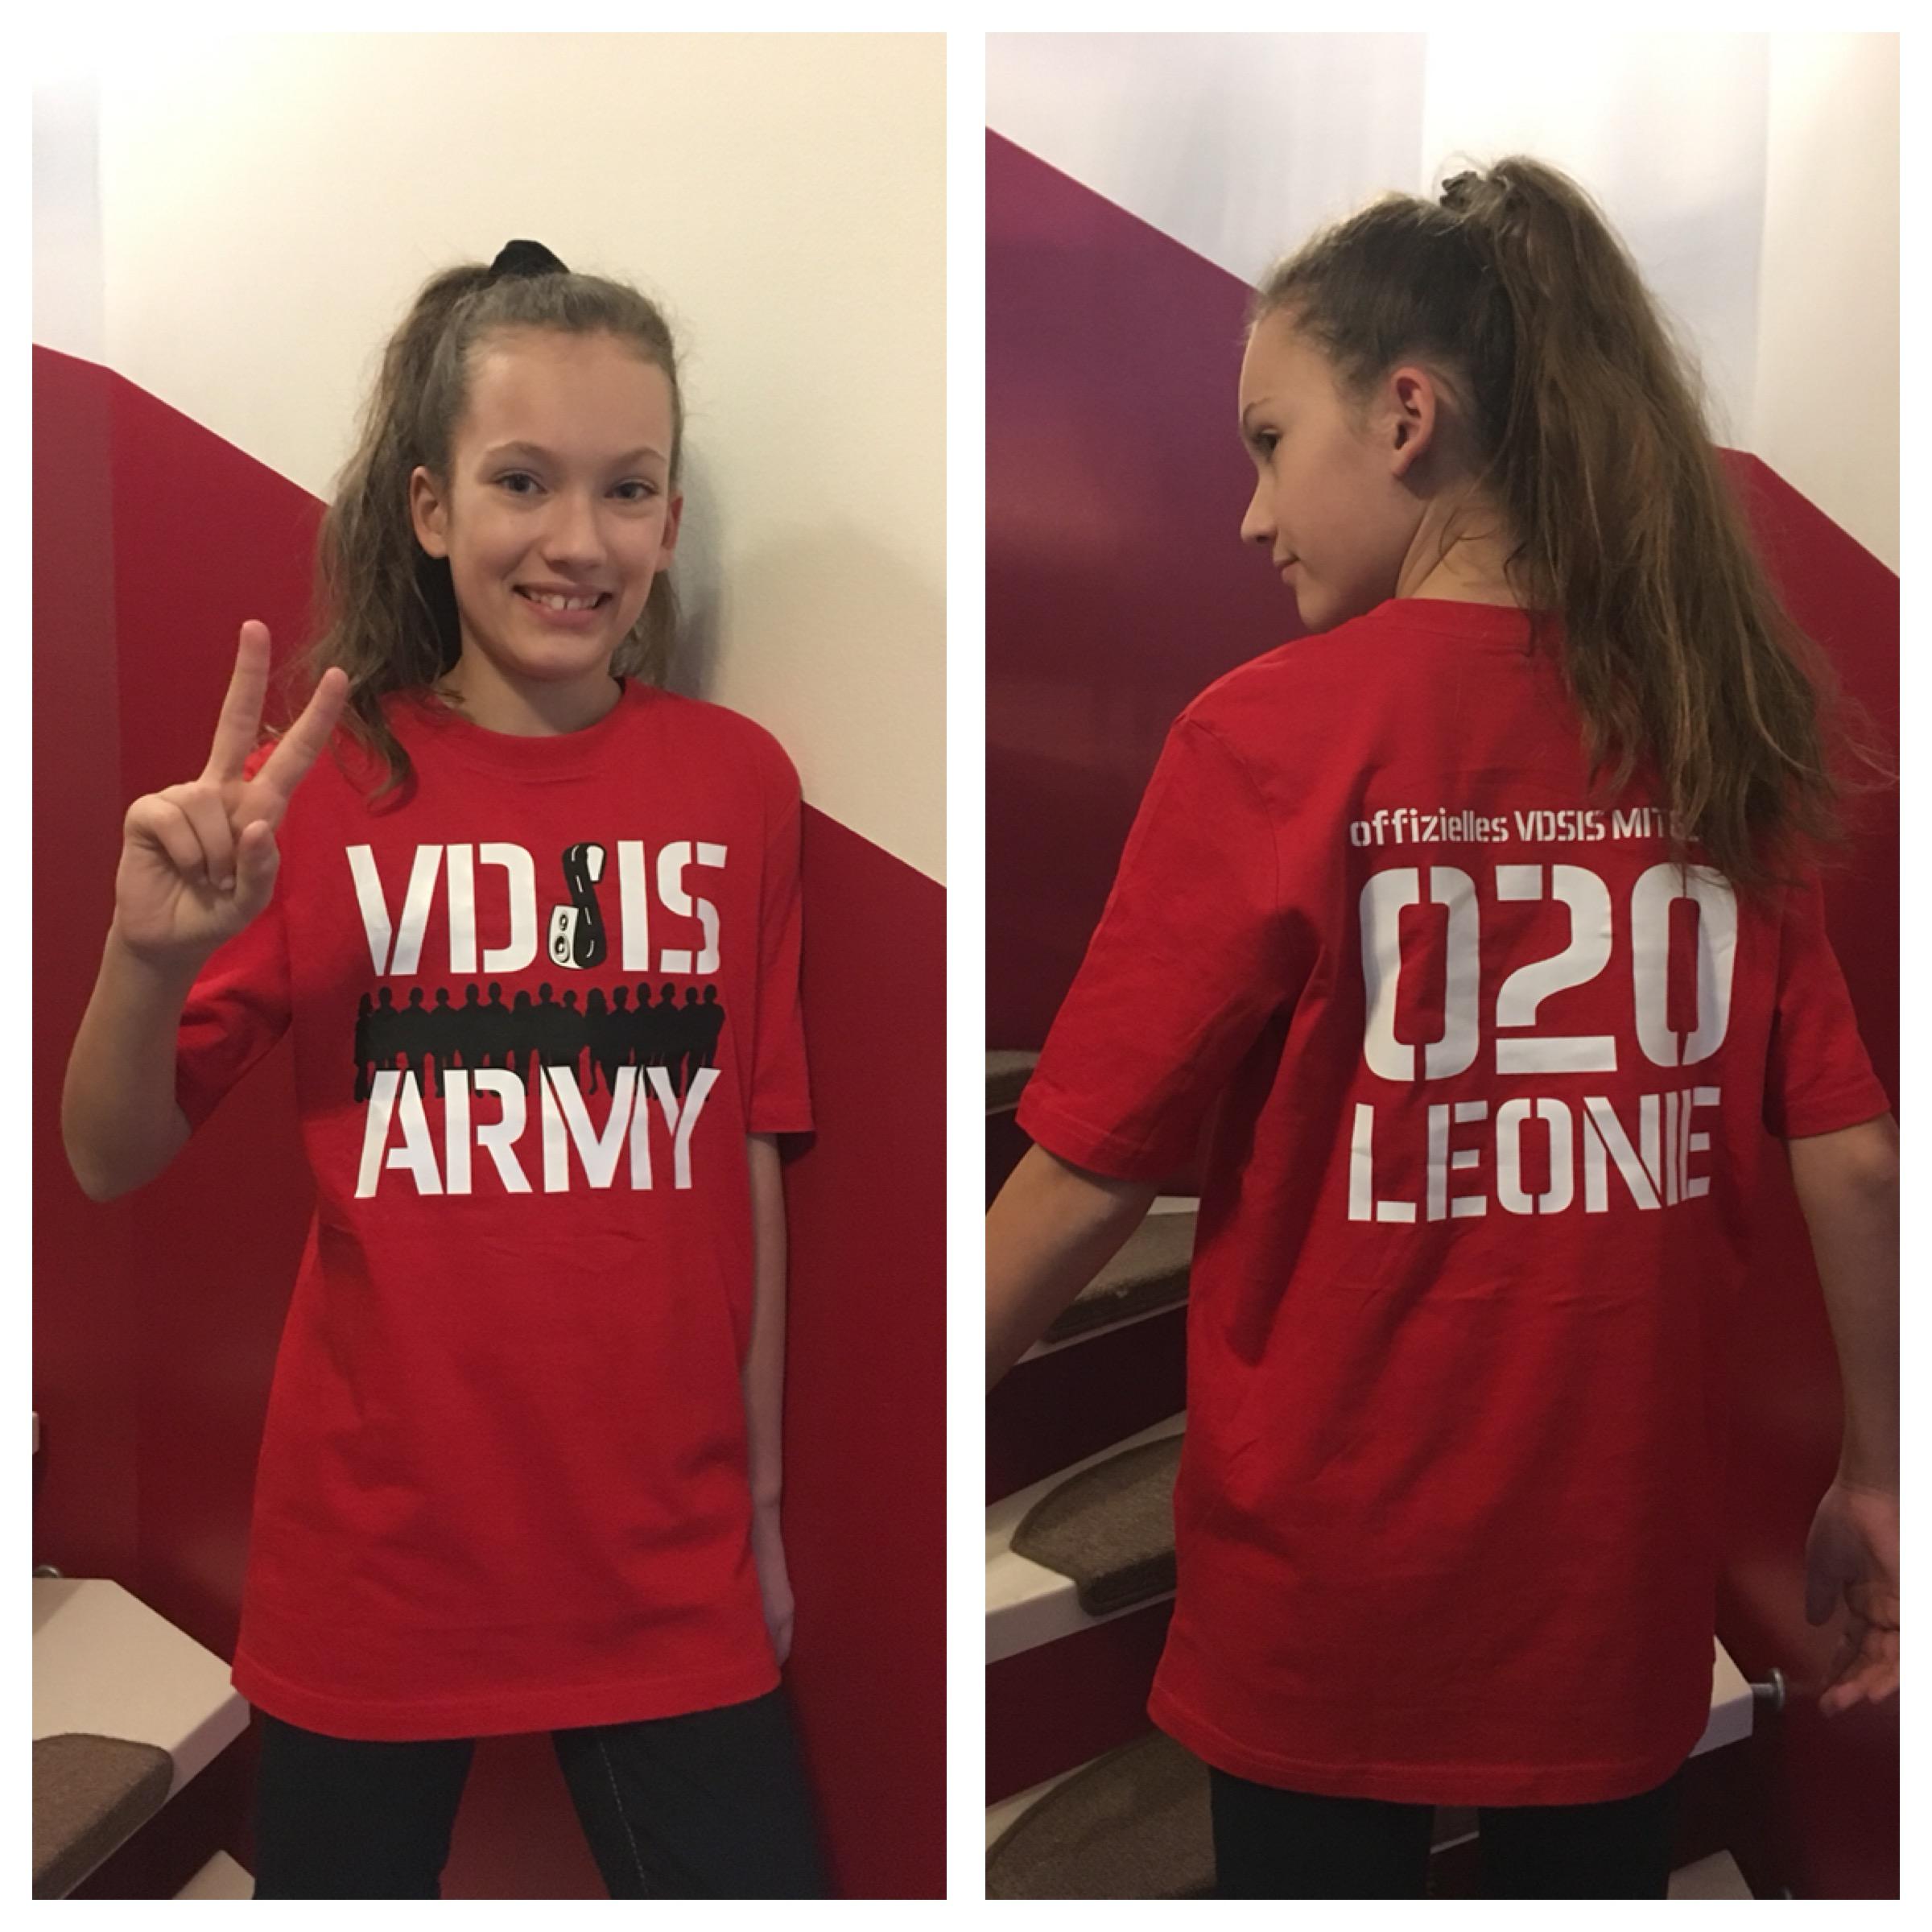 020 Leonie vdsisarmy